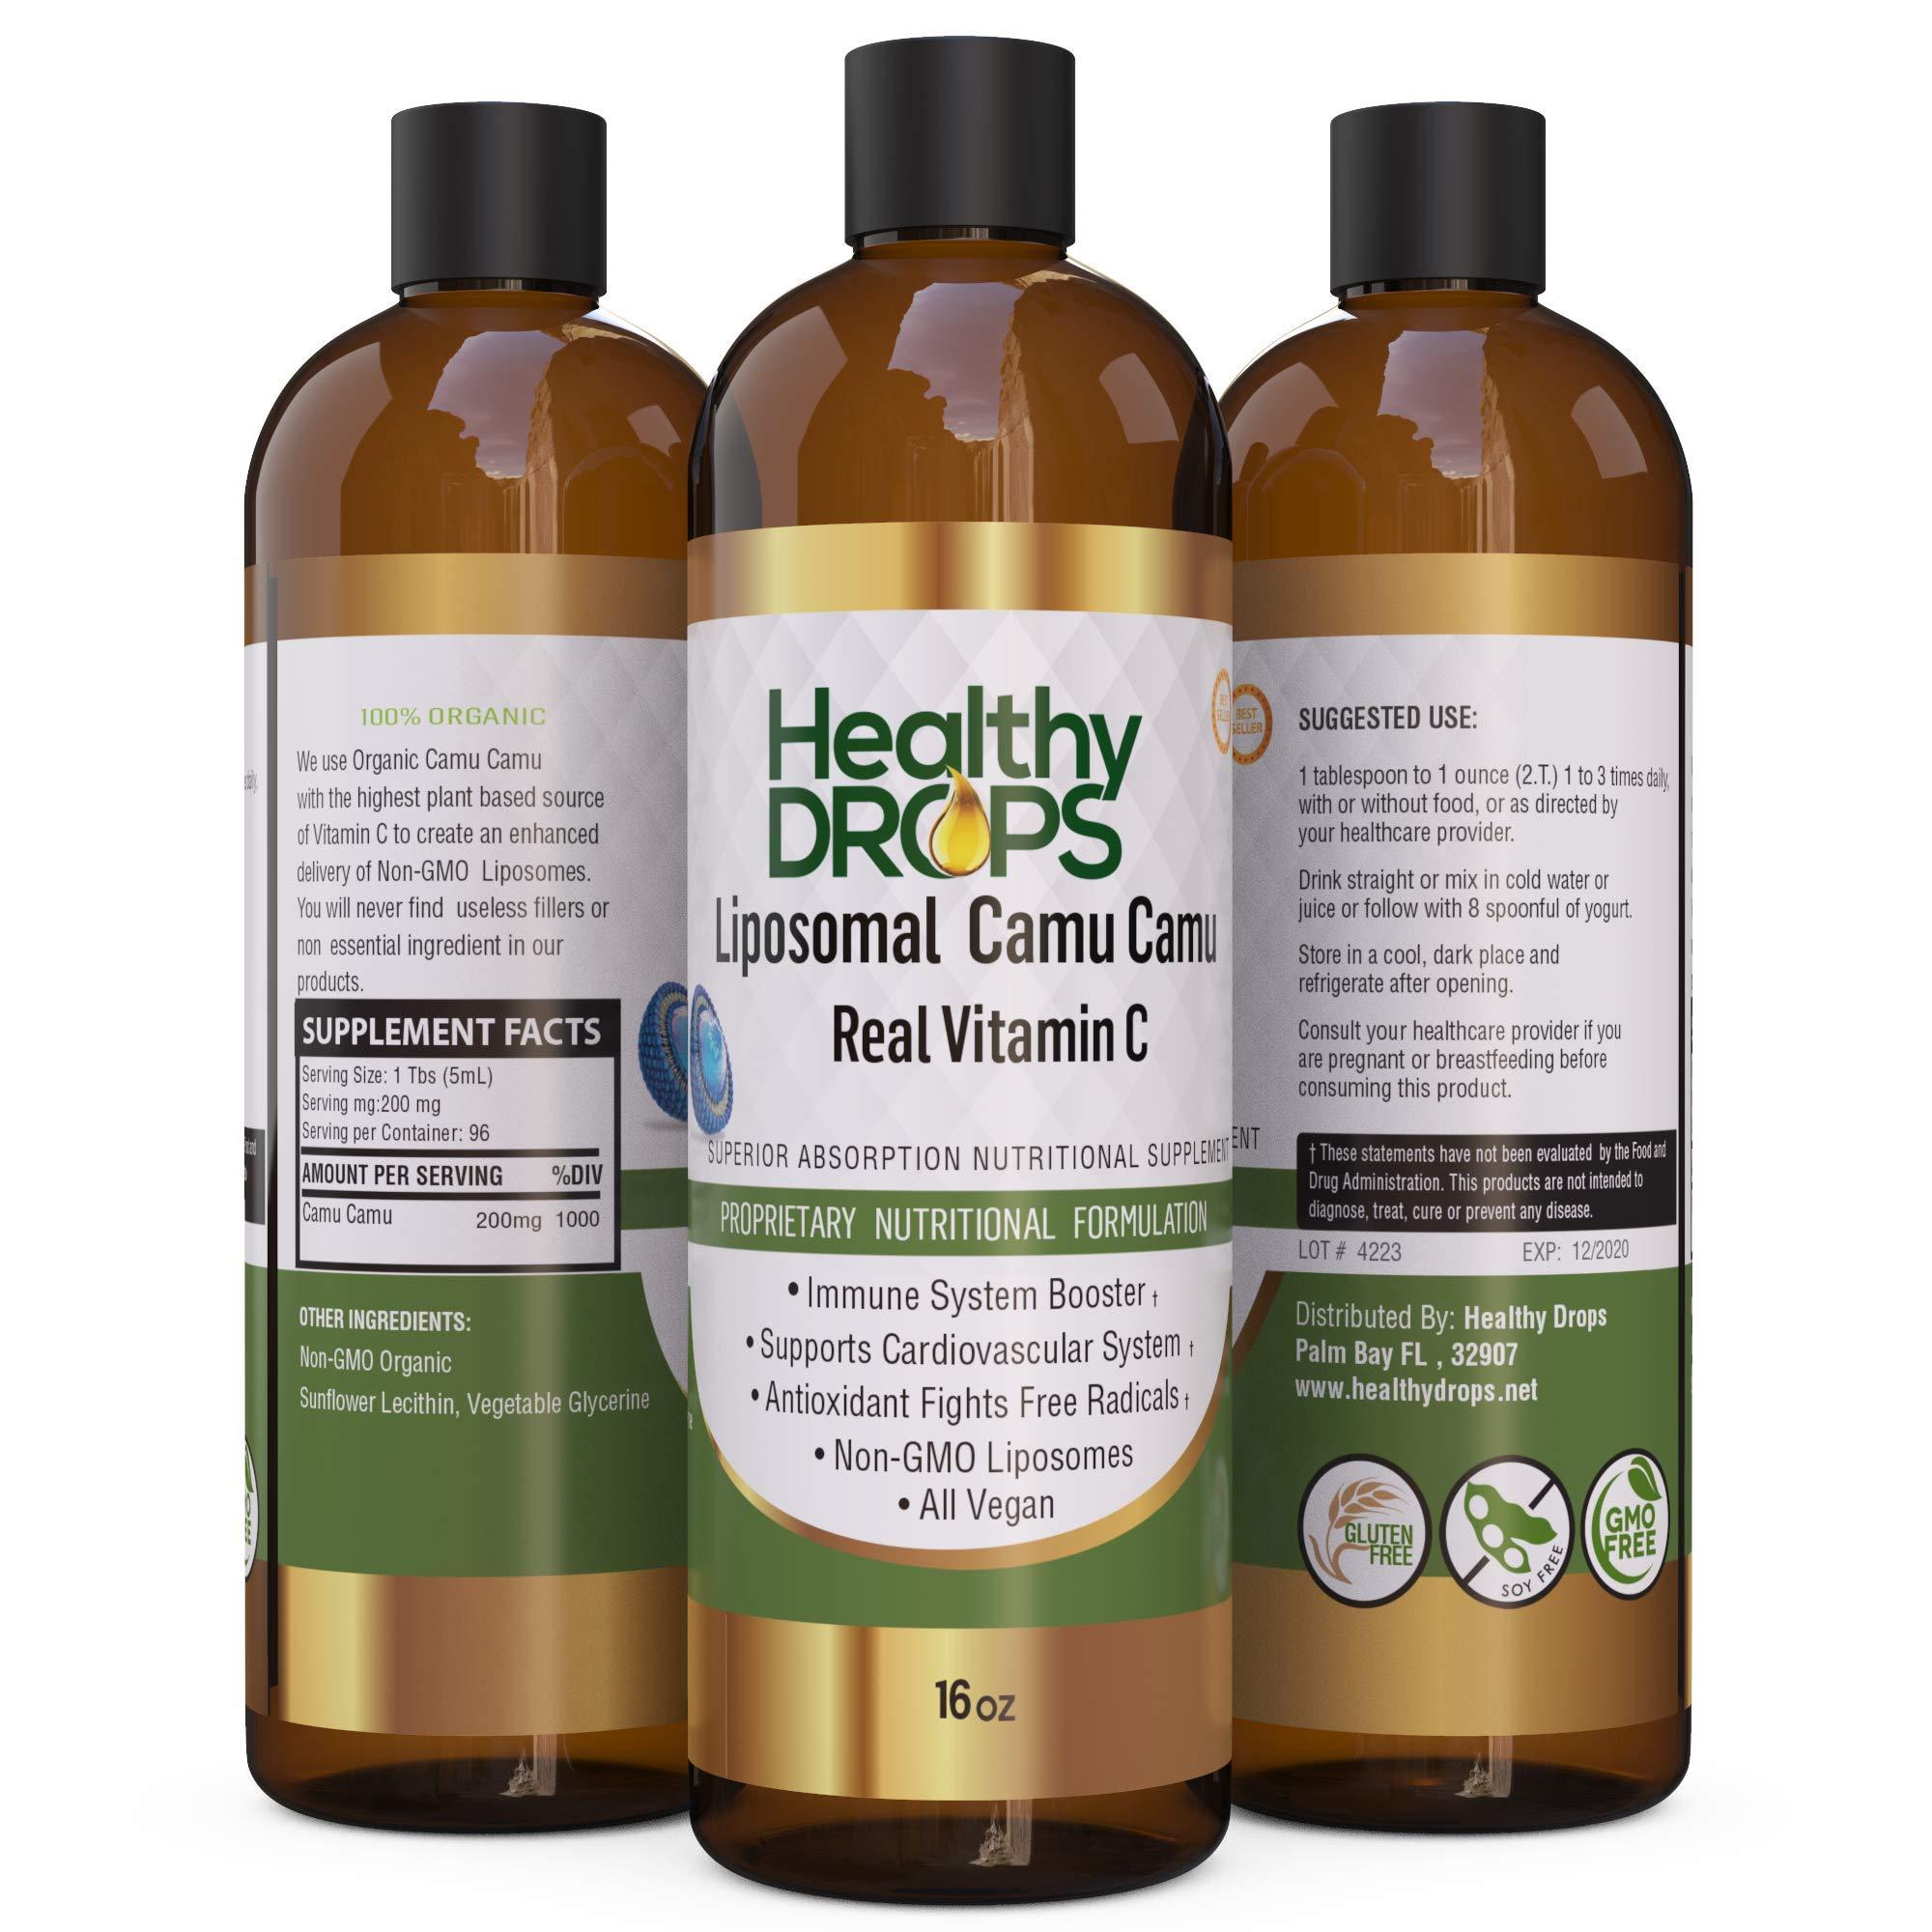 Vitamin C Liquid Supplement, Real Vitamin C from CAMU CAMU 13X Stronger - 200mg Liposomal Fruit Based Extract, Non-GMO, Vegan - 96 Doses - 16 Ounces